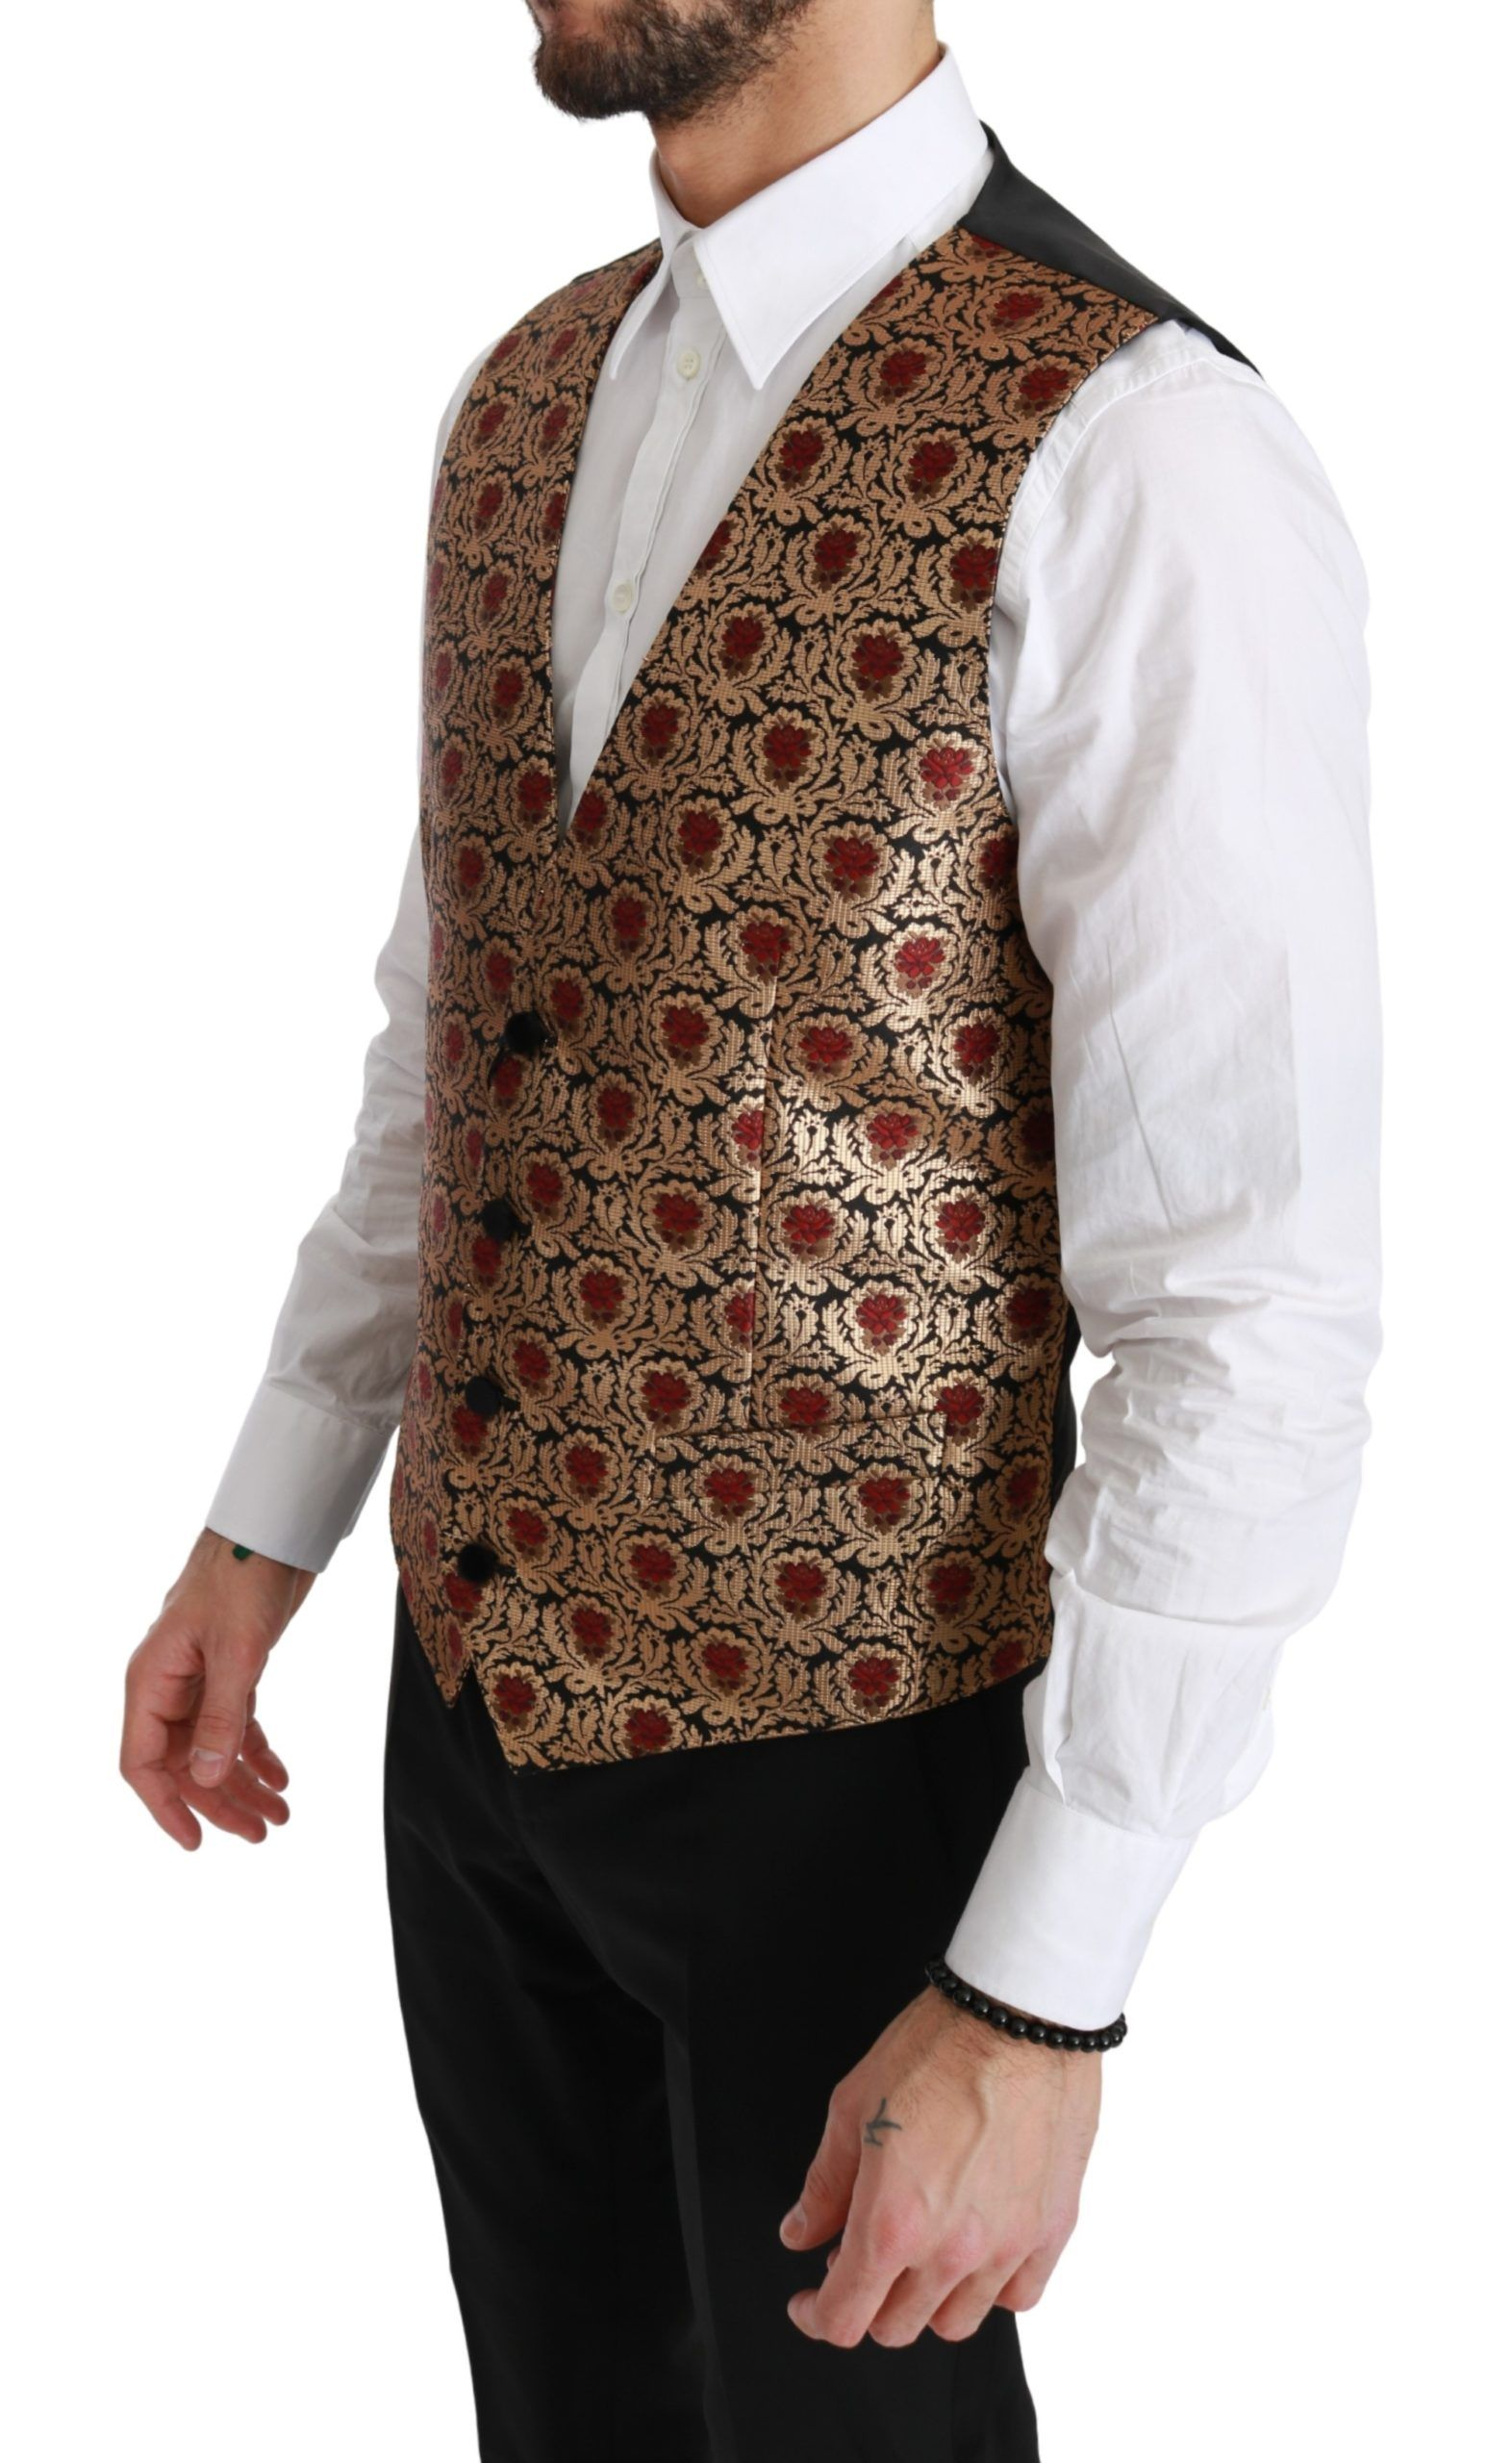 Dolce & Gabbana Gold Brocade Waistcoat Formal Polyester Vest